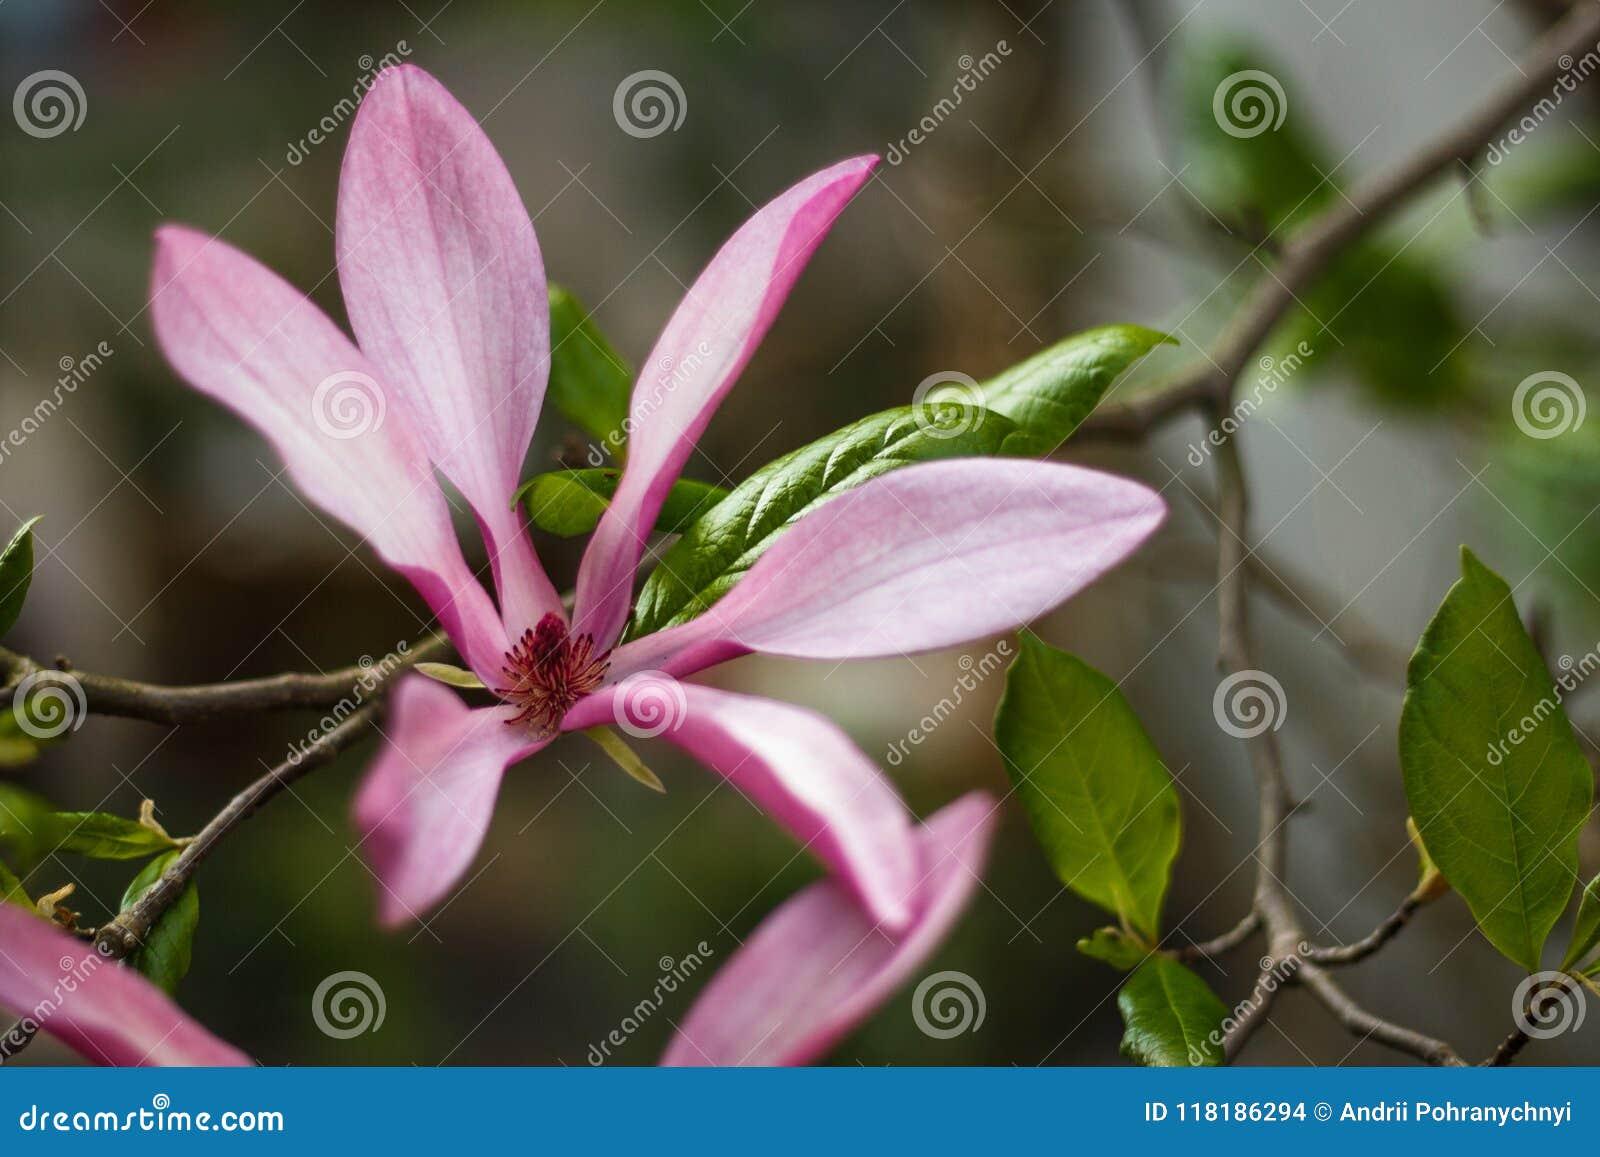 Beautiful Purple Magnolia Flowers In The Spring Season On The